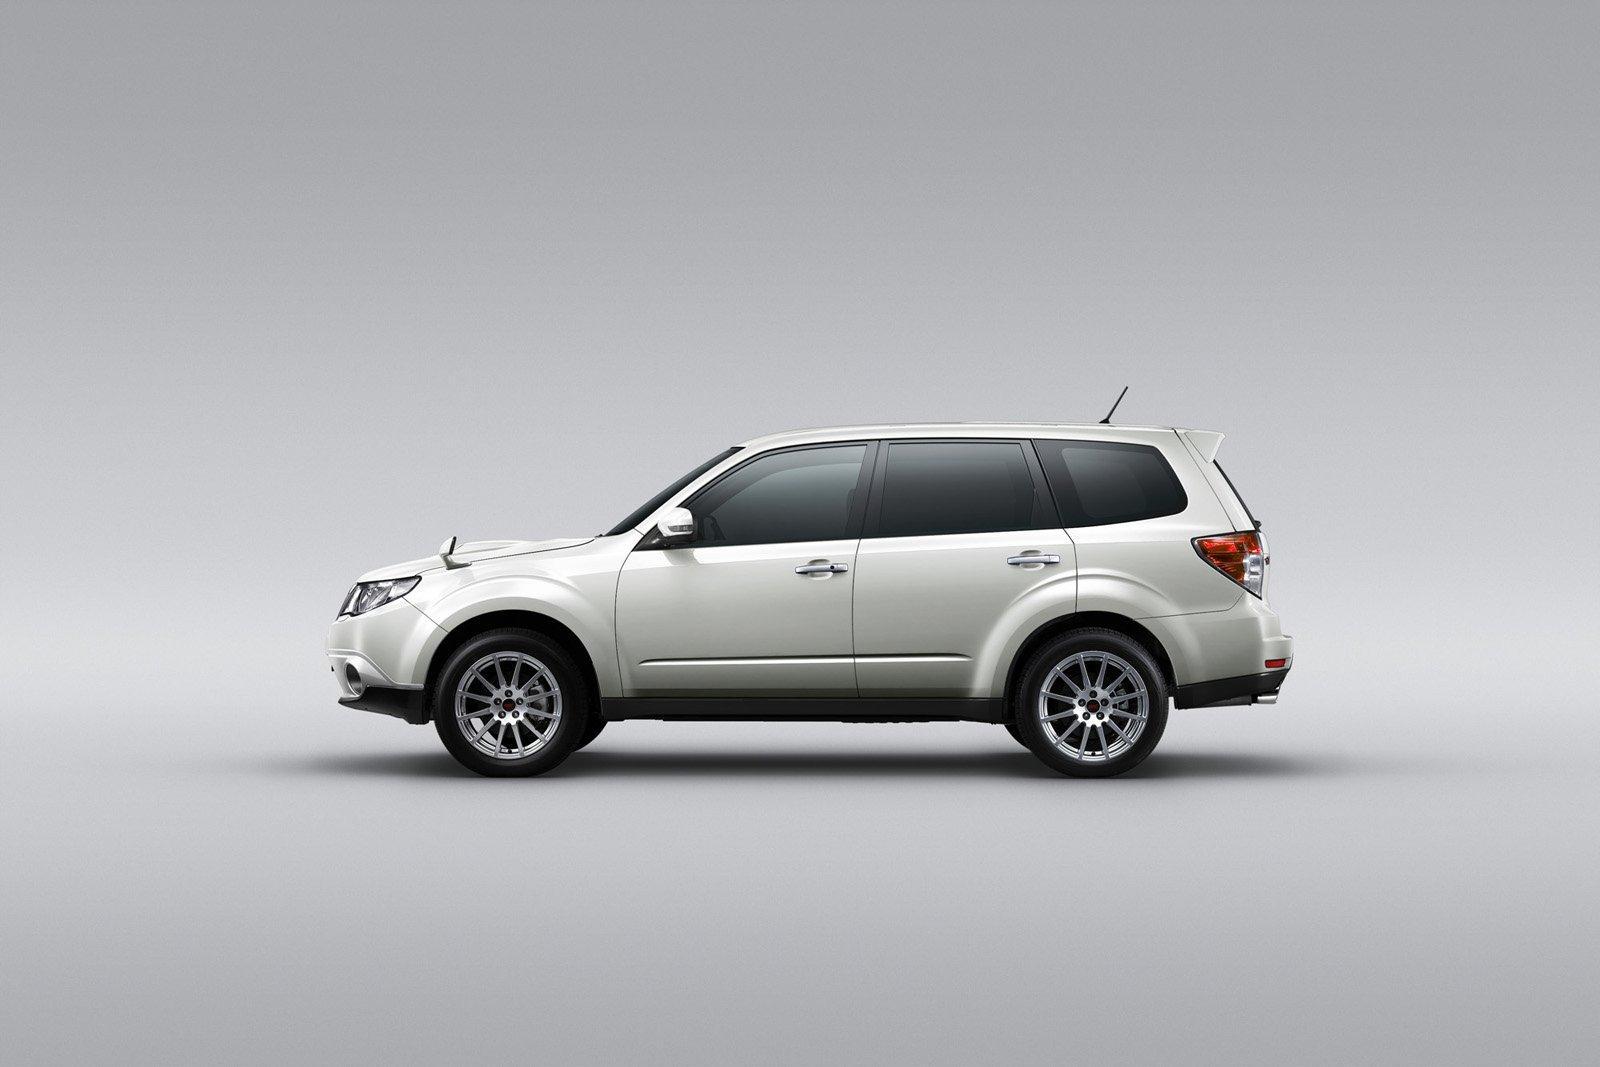 2011 Subaru Forester St Family Turbo Vehicle